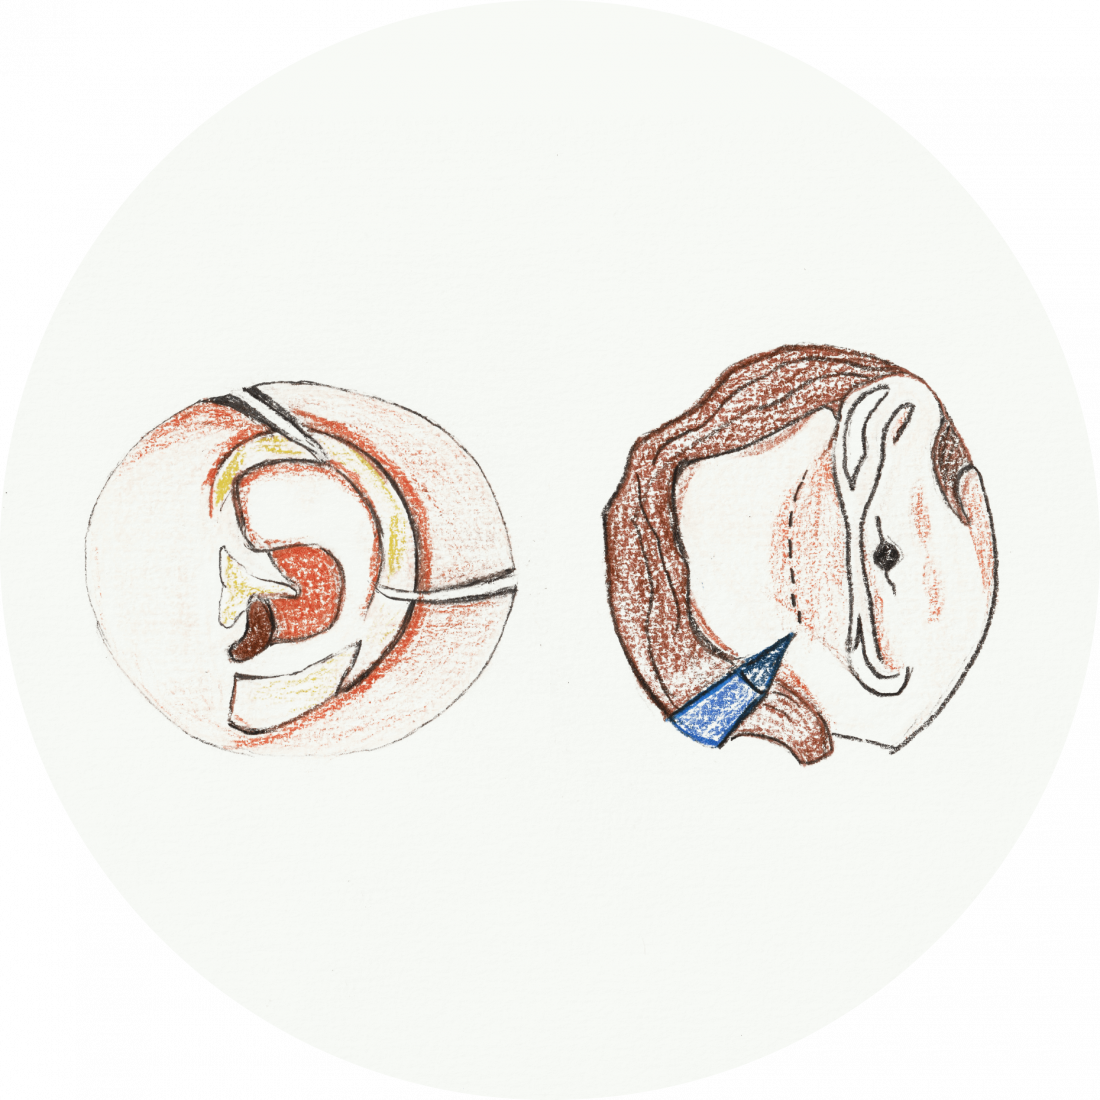 Procedure details: Ear Reshaping